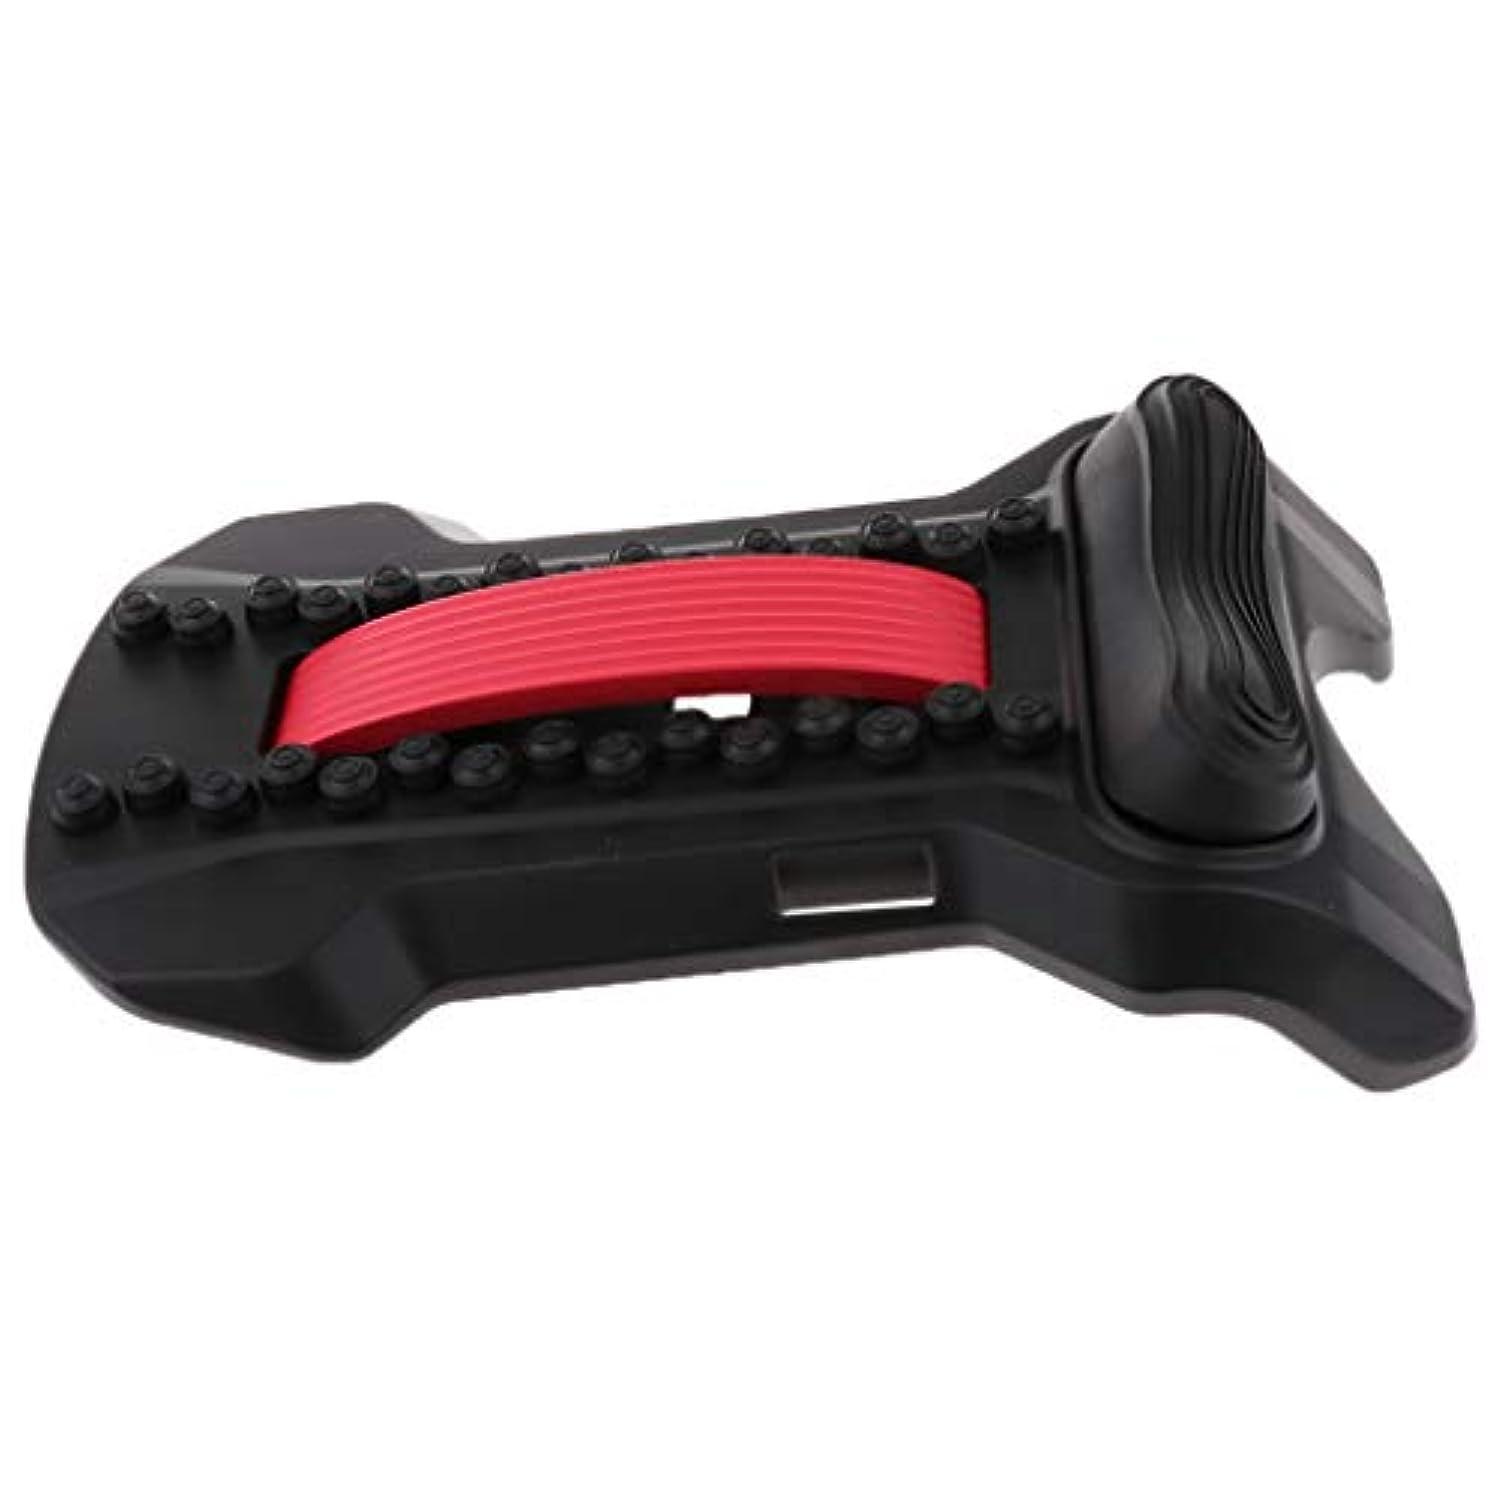 D DOLITY 腰椎サポート バック ストレッチャー 頸椎 ストレッチ マッサージャー ツボ押し 姿勢矯正 全5色 - 黒赤, 22×37×8cm